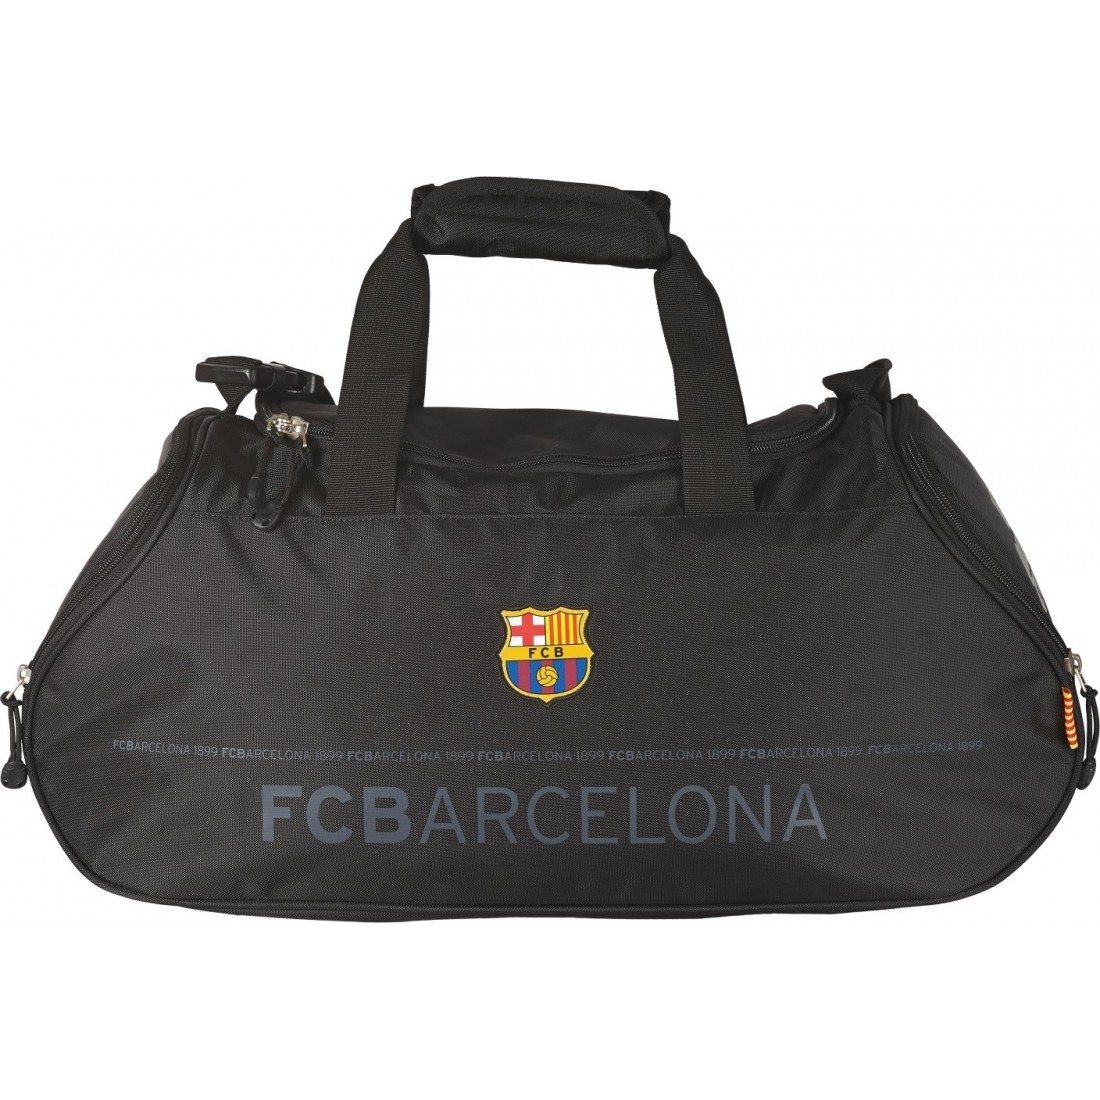 34eea358182a7 Torba Treningowa FC Barcelona - plecak-tornister.pl